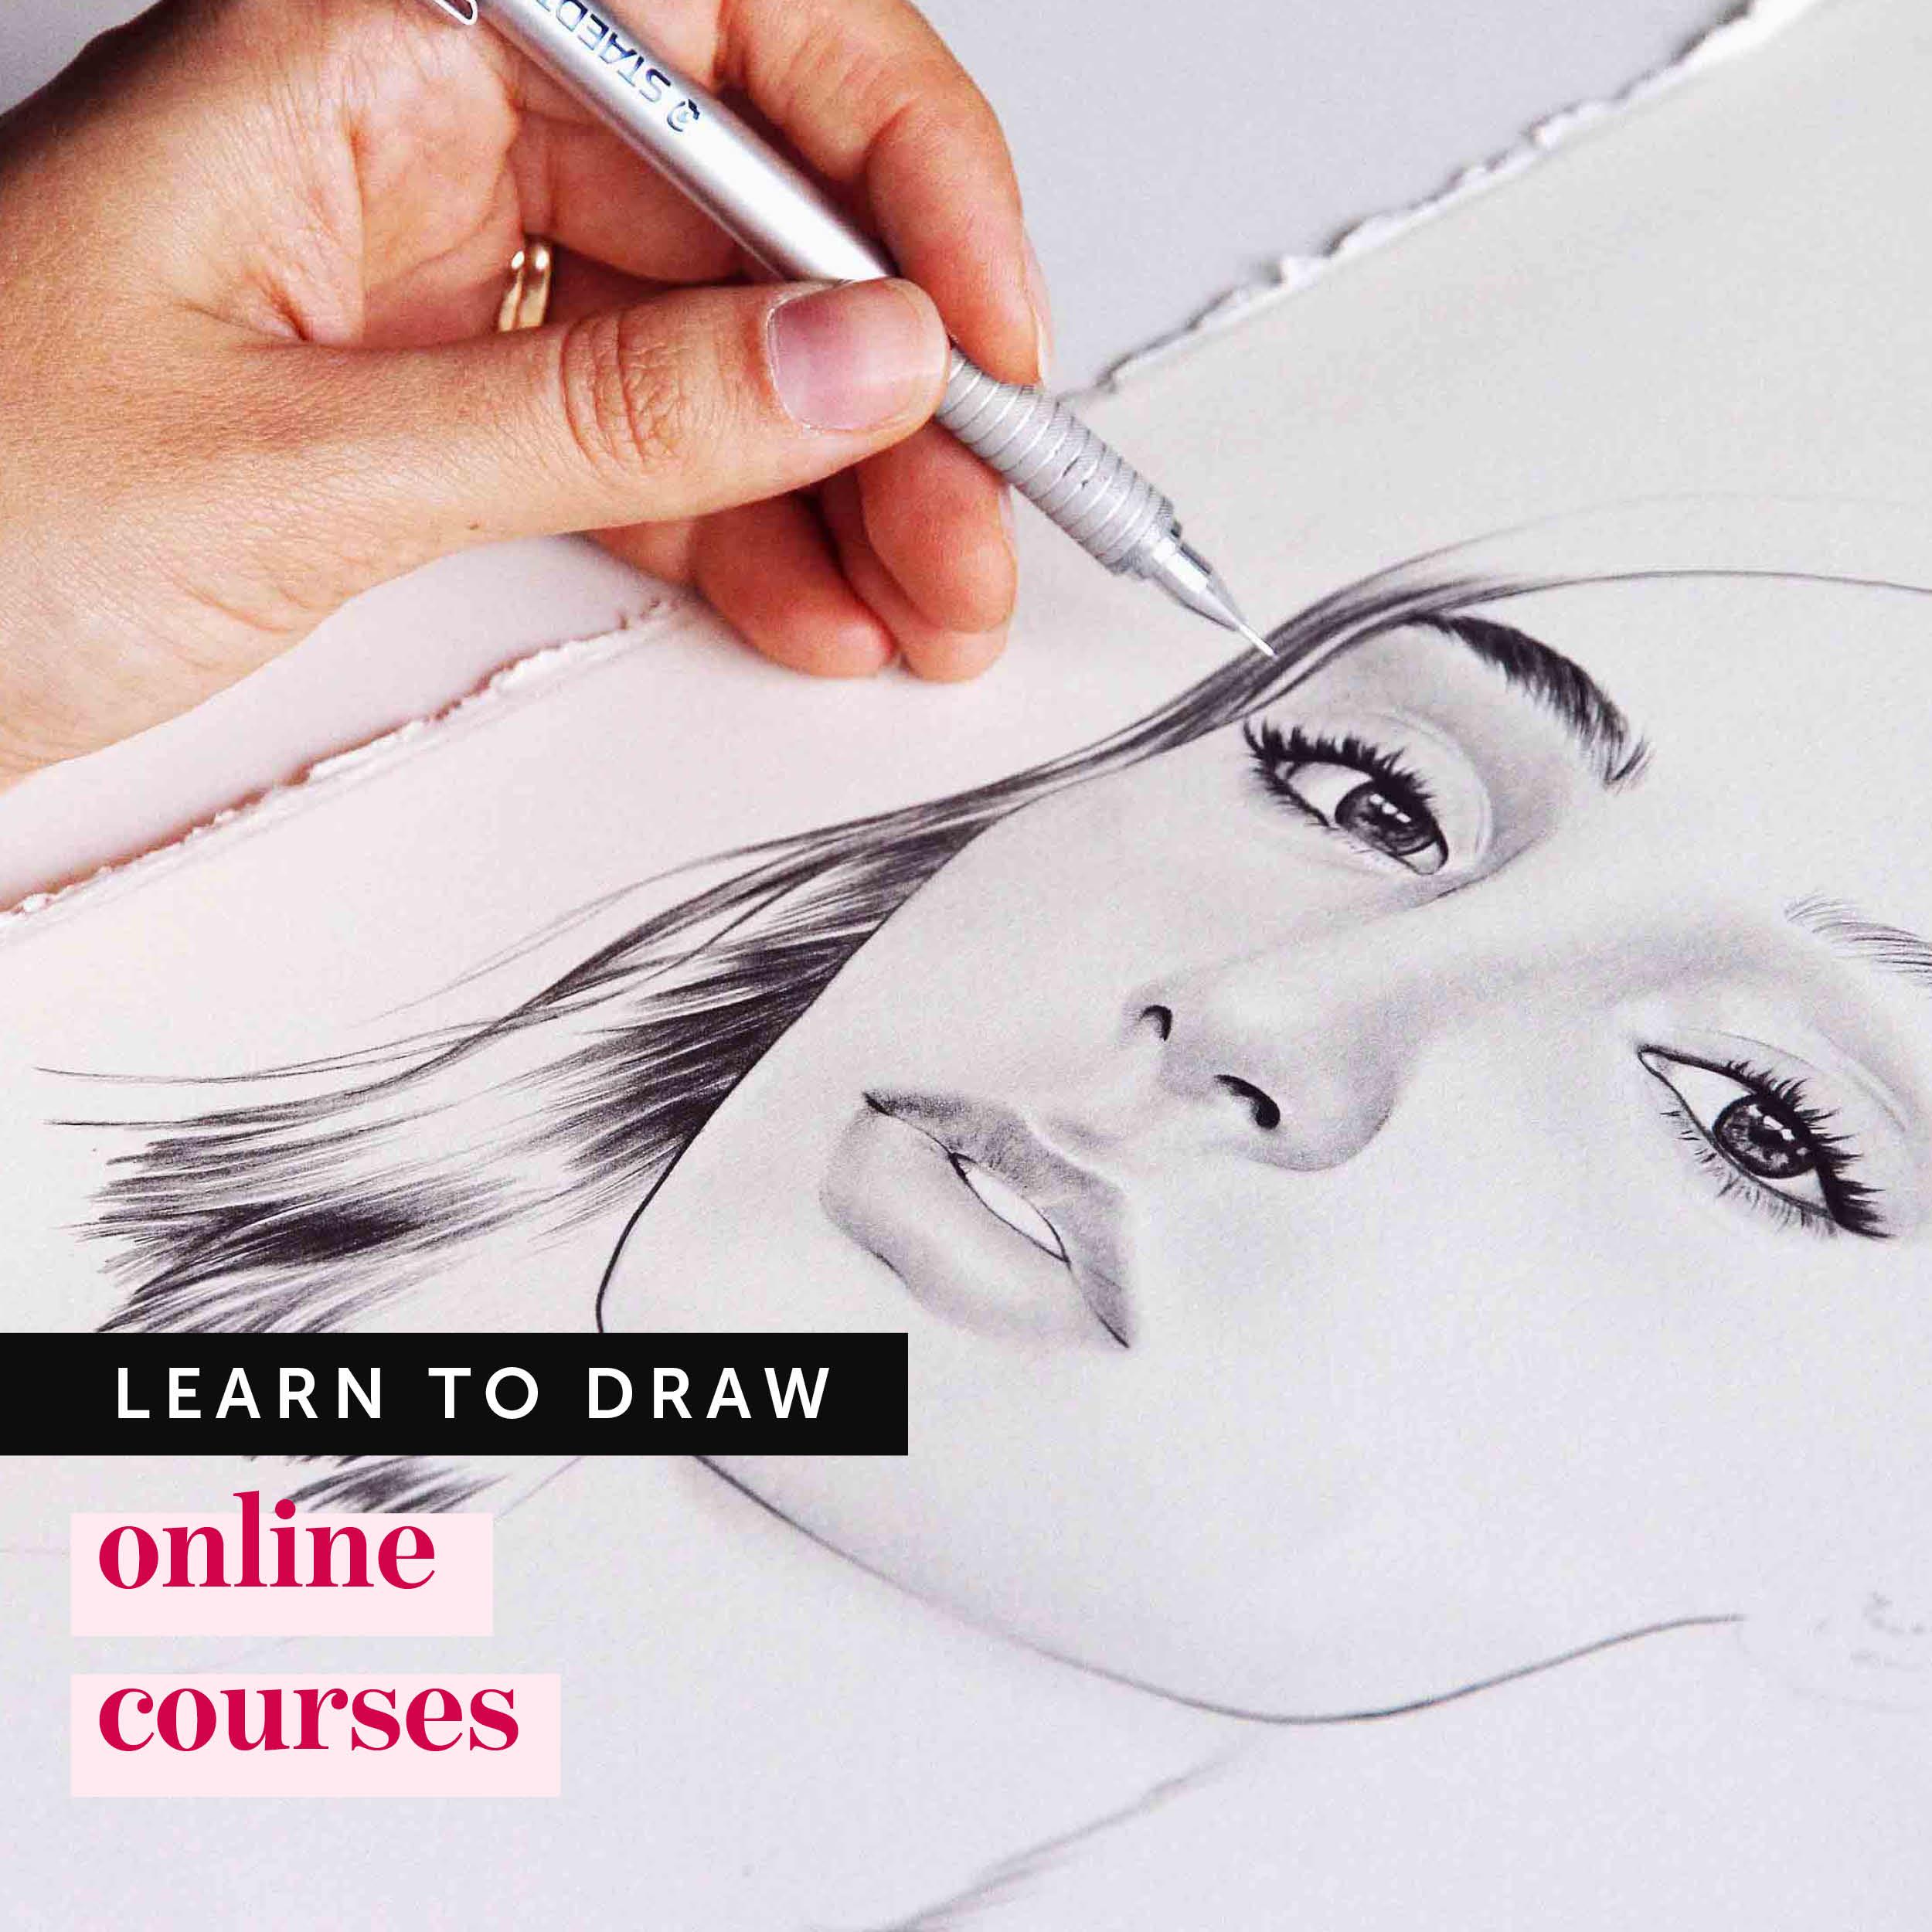 Online Courses Tile.jpg